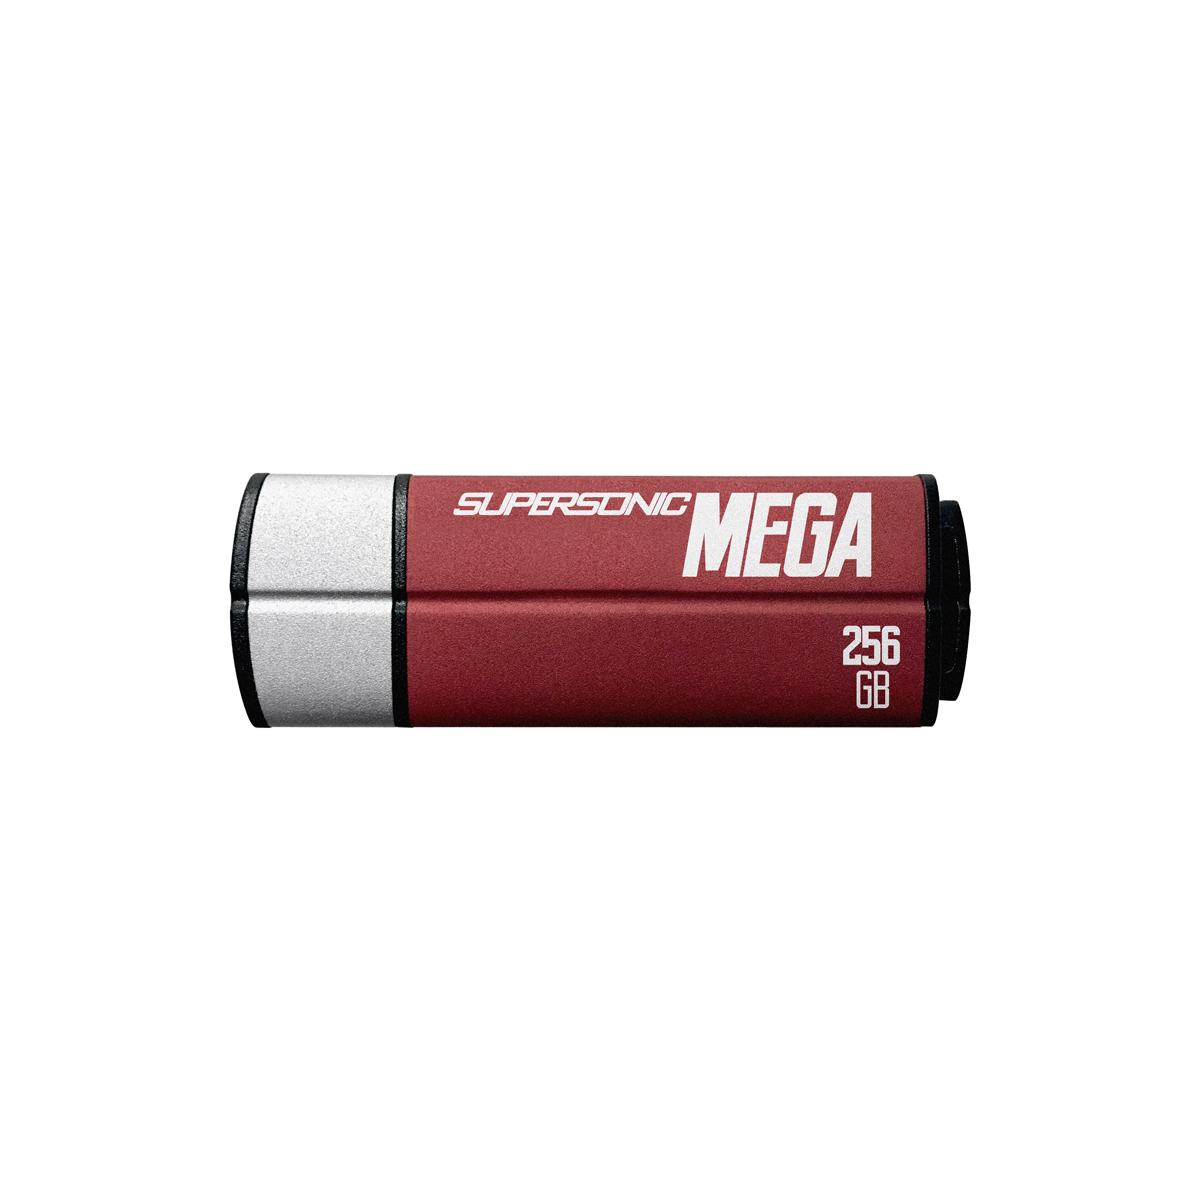 256GB Patriot Mega USB 3.1 380/70MBs